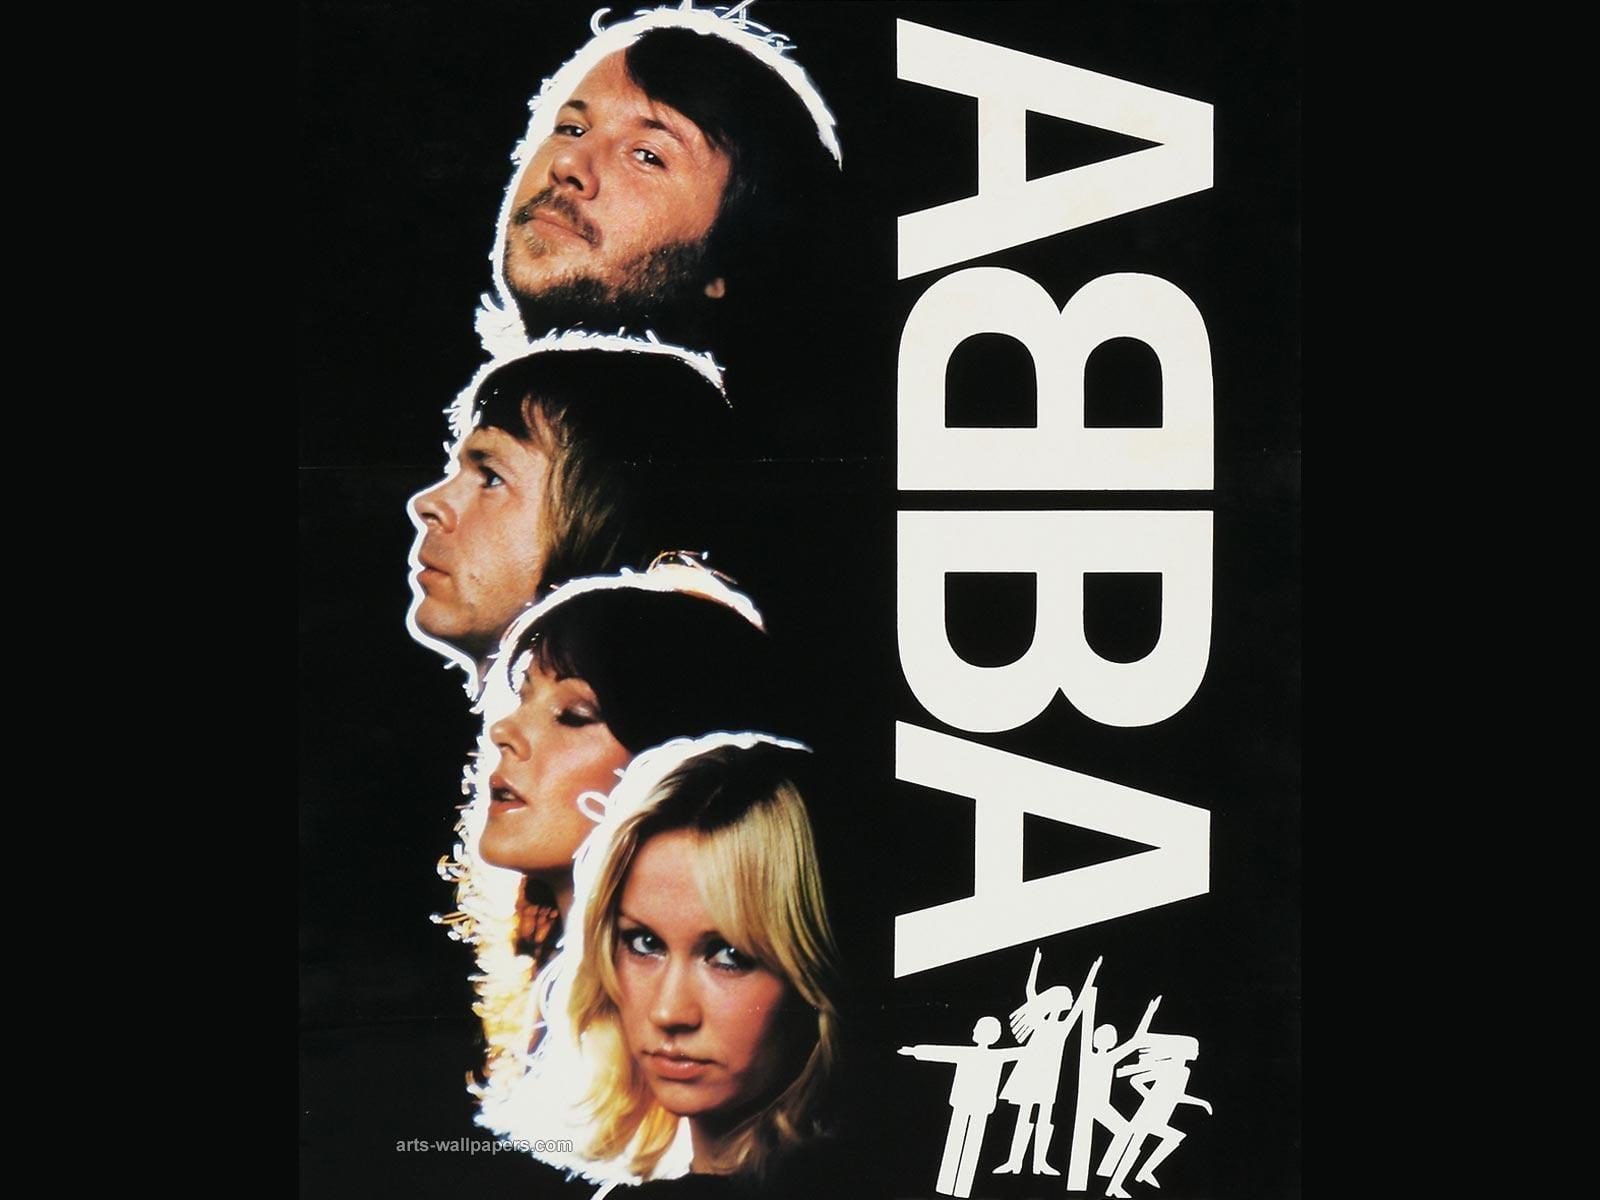 When Did Abba Breakup? The Pop-Sensation Are Back